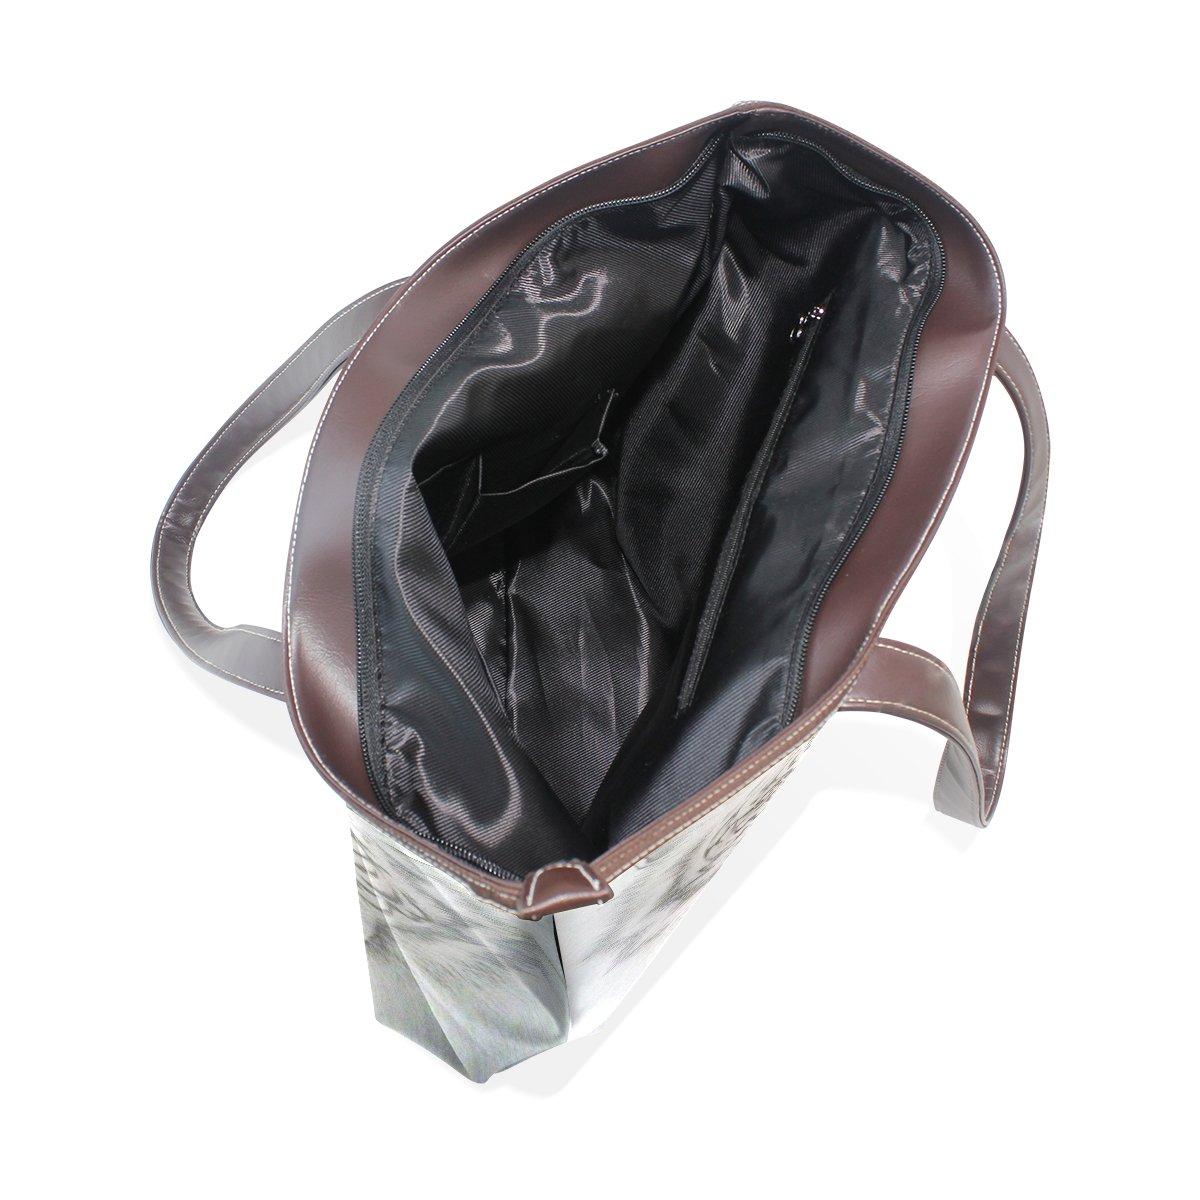 Ye Store White Tiger Lady PU Leather Handbag Tote Bag Shoulder Bag Shopping Bag